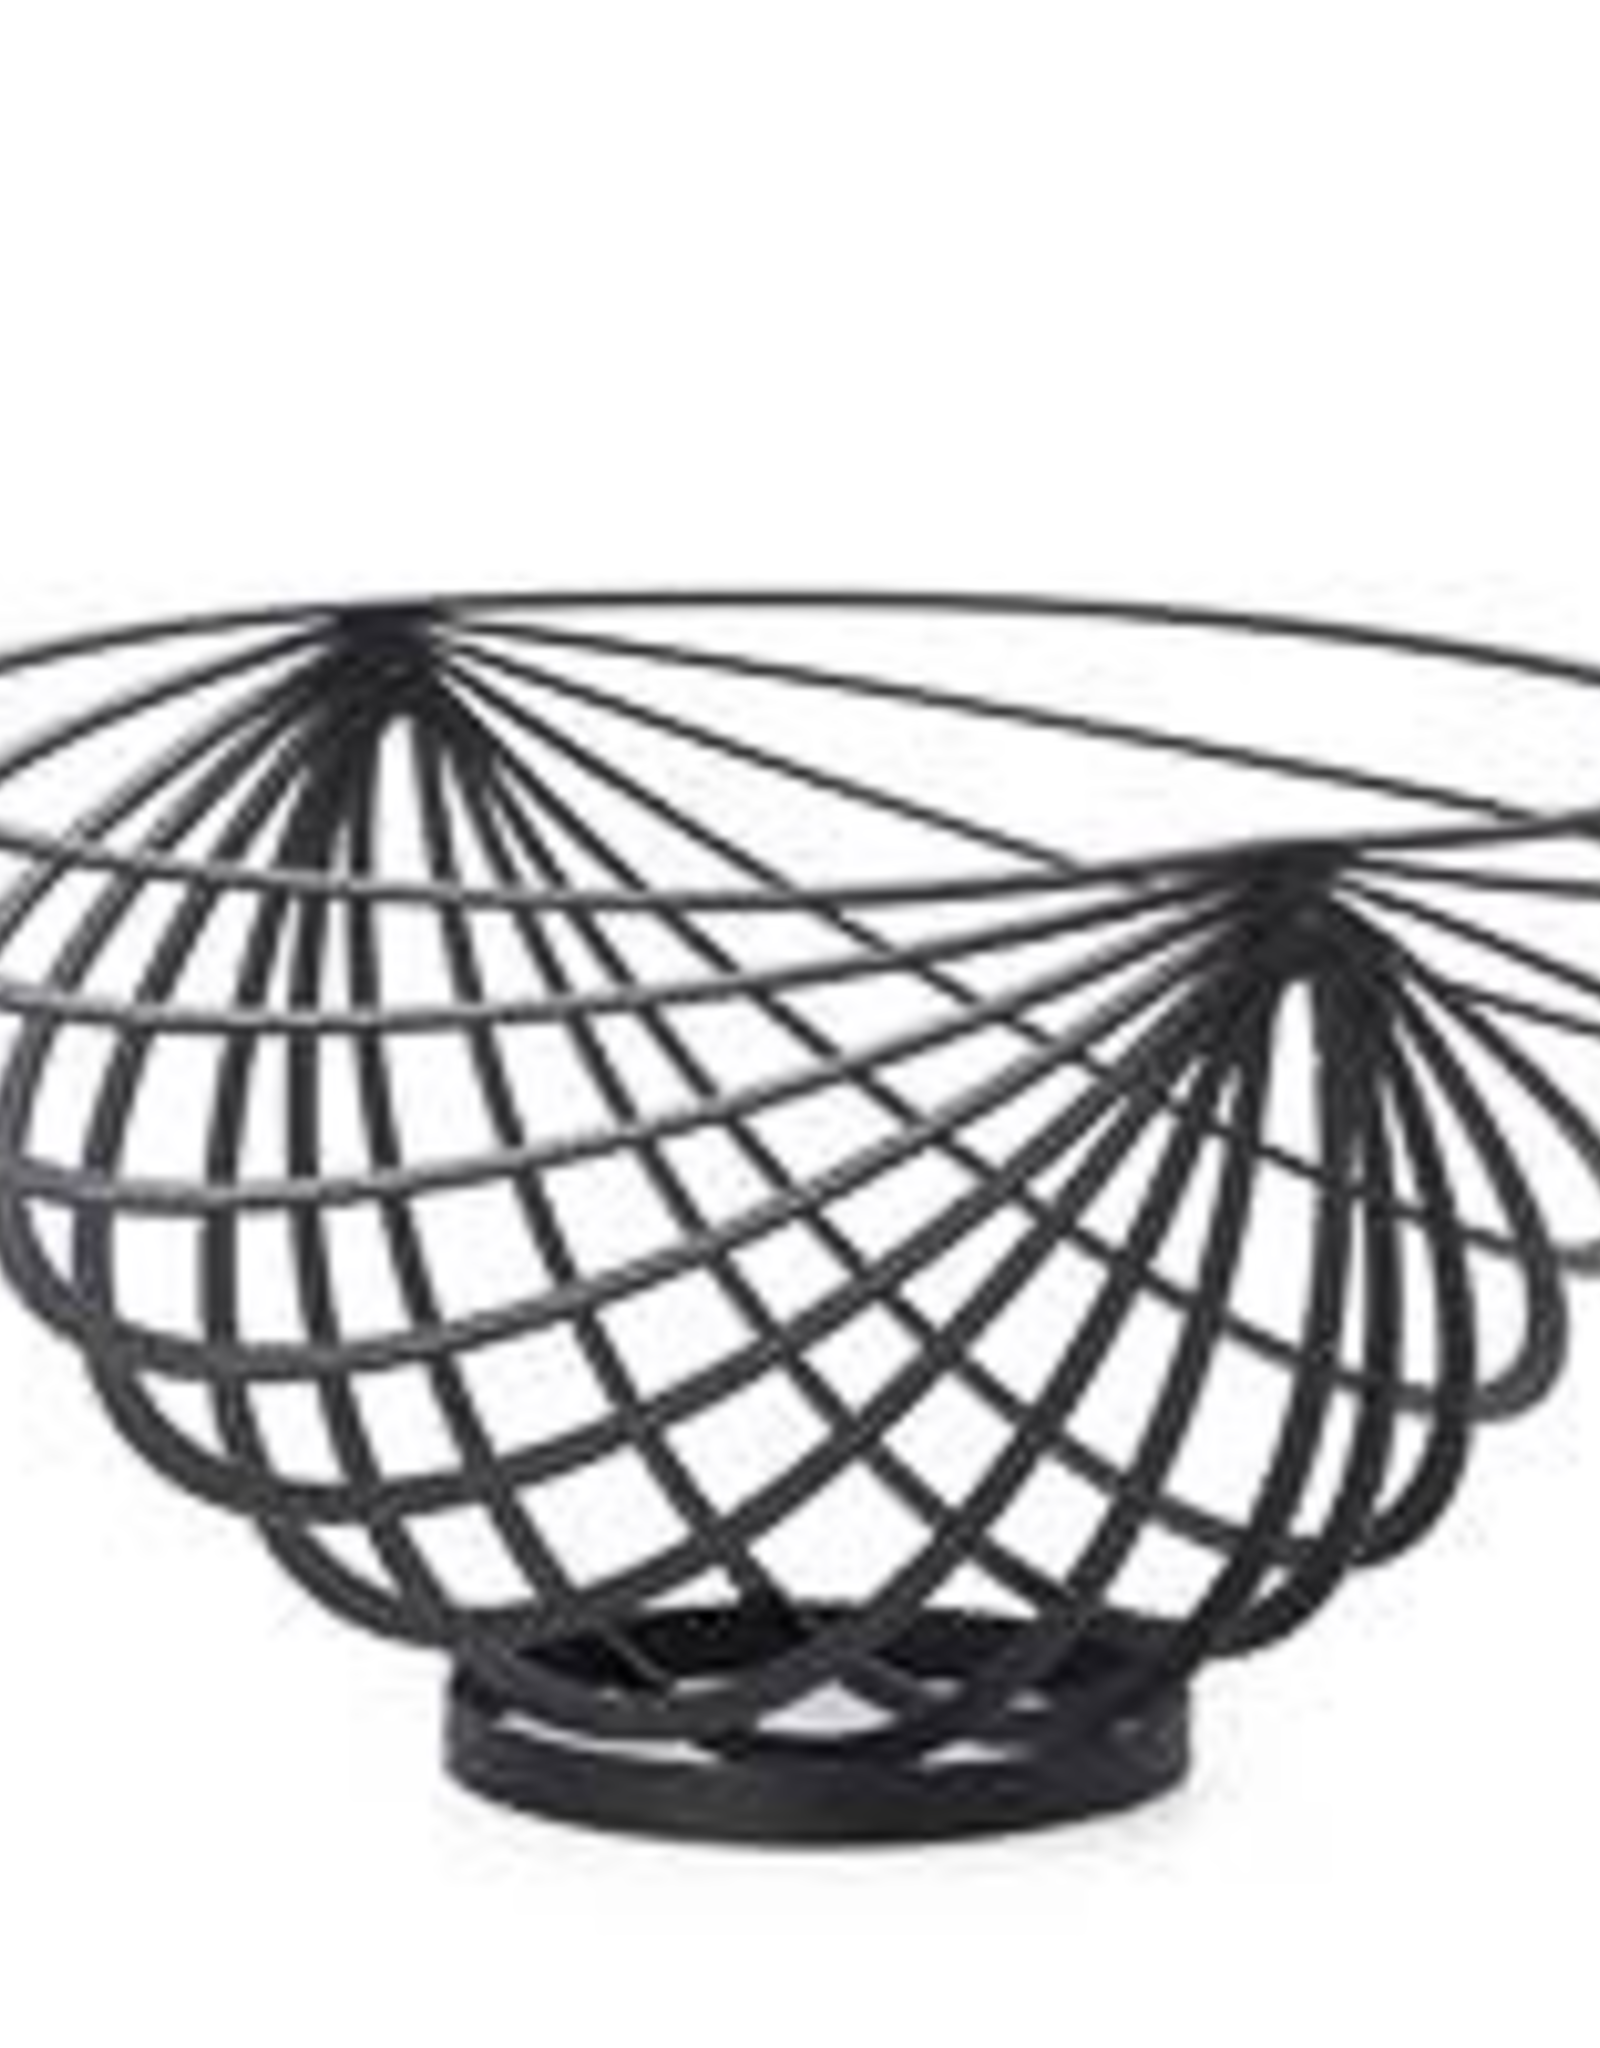 Basket, Fruit, Eclipse Rib, Black